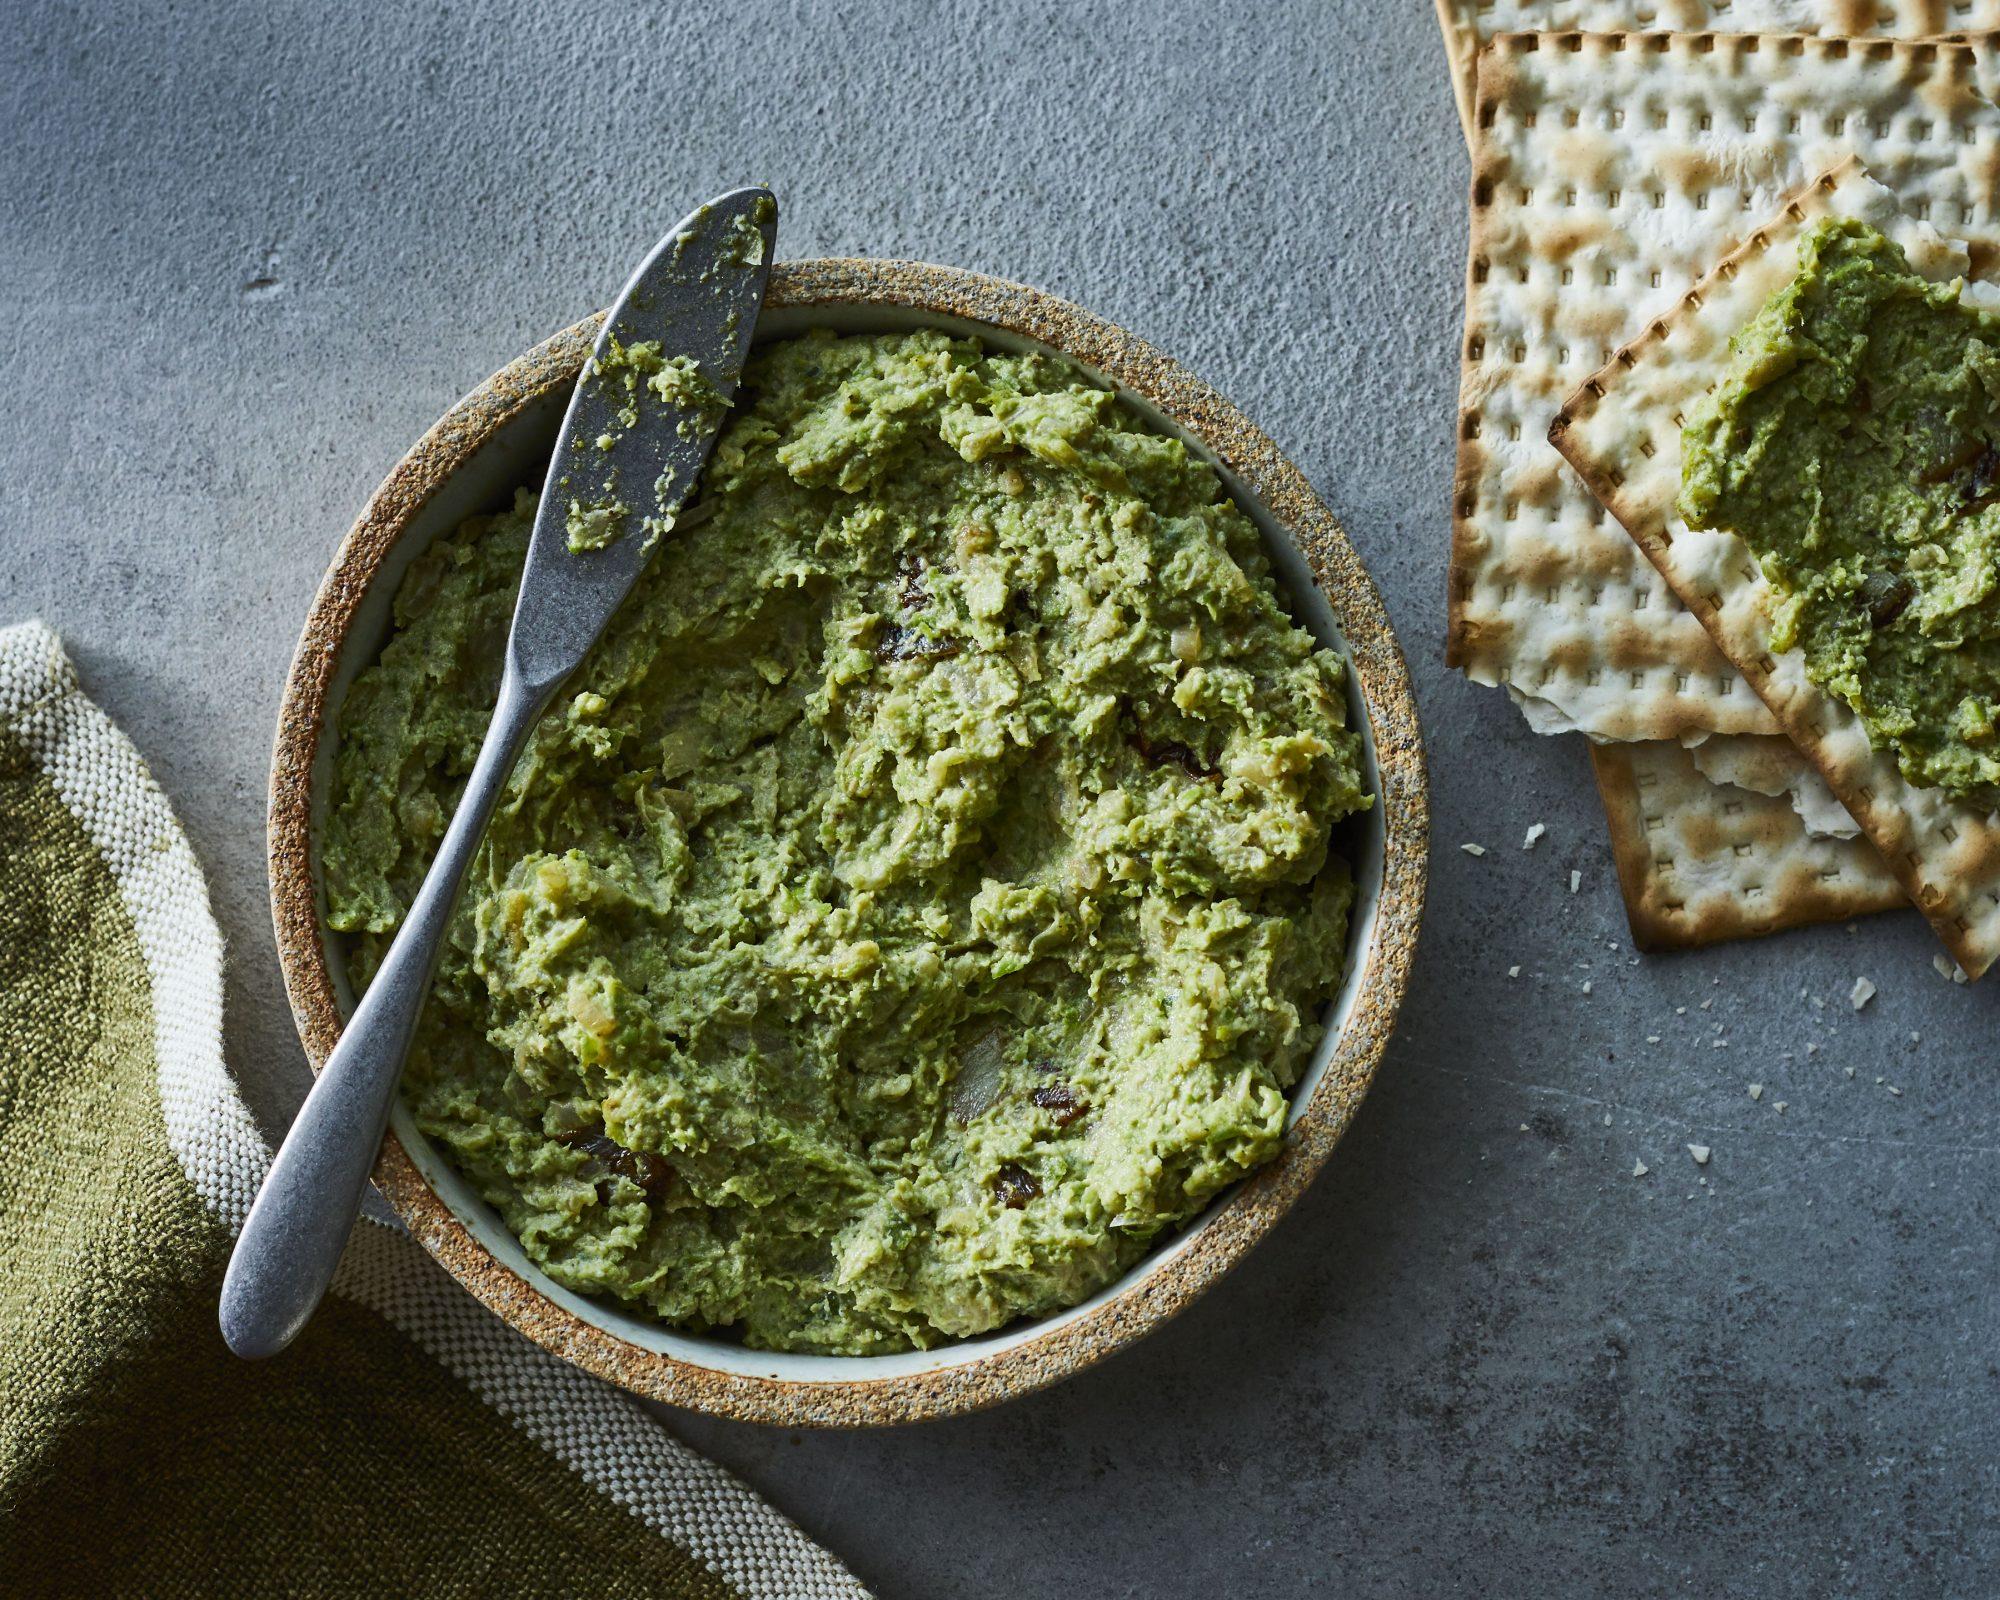 Safta's Mock Liver (Green Bean and Pea Pate)